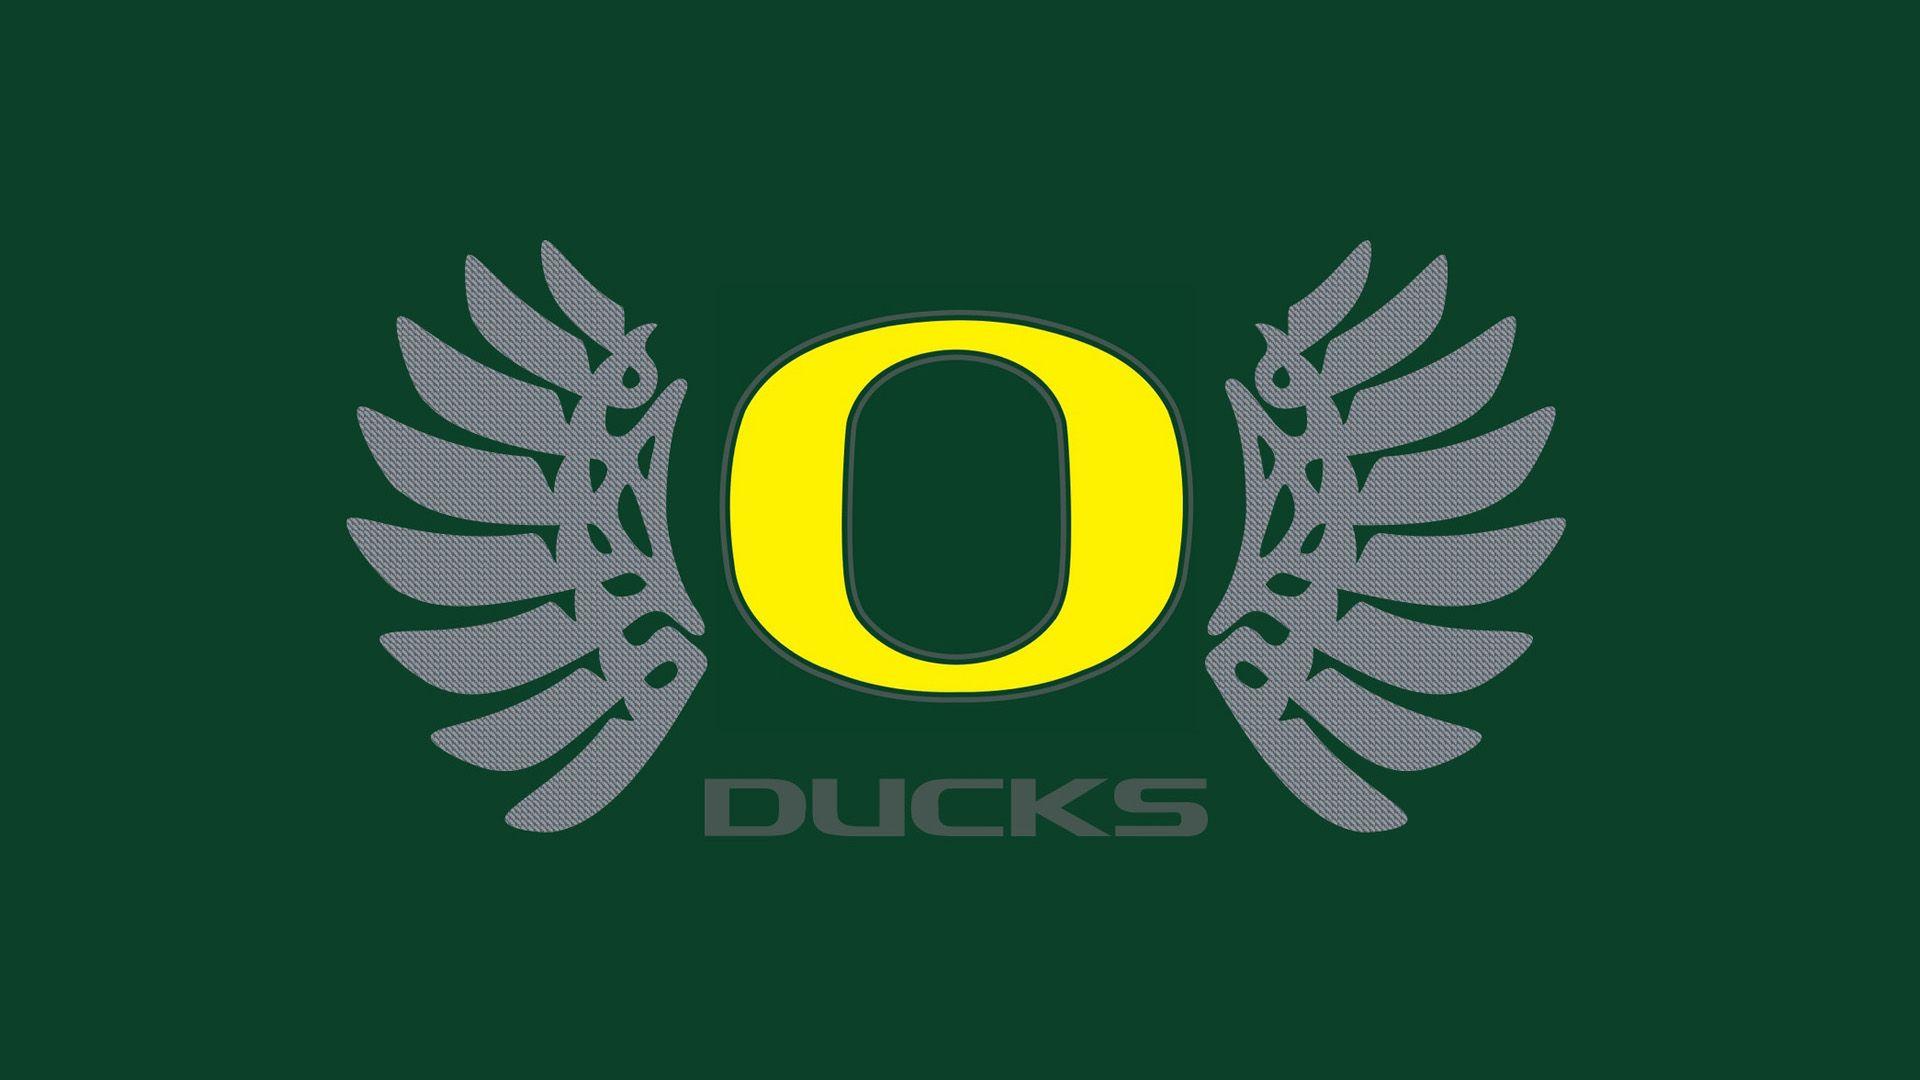 Oregon Ducks Logo Wallpaper Background 8294 Oregon Ducks Logo Oregon Ducks Oregon Ducks Football